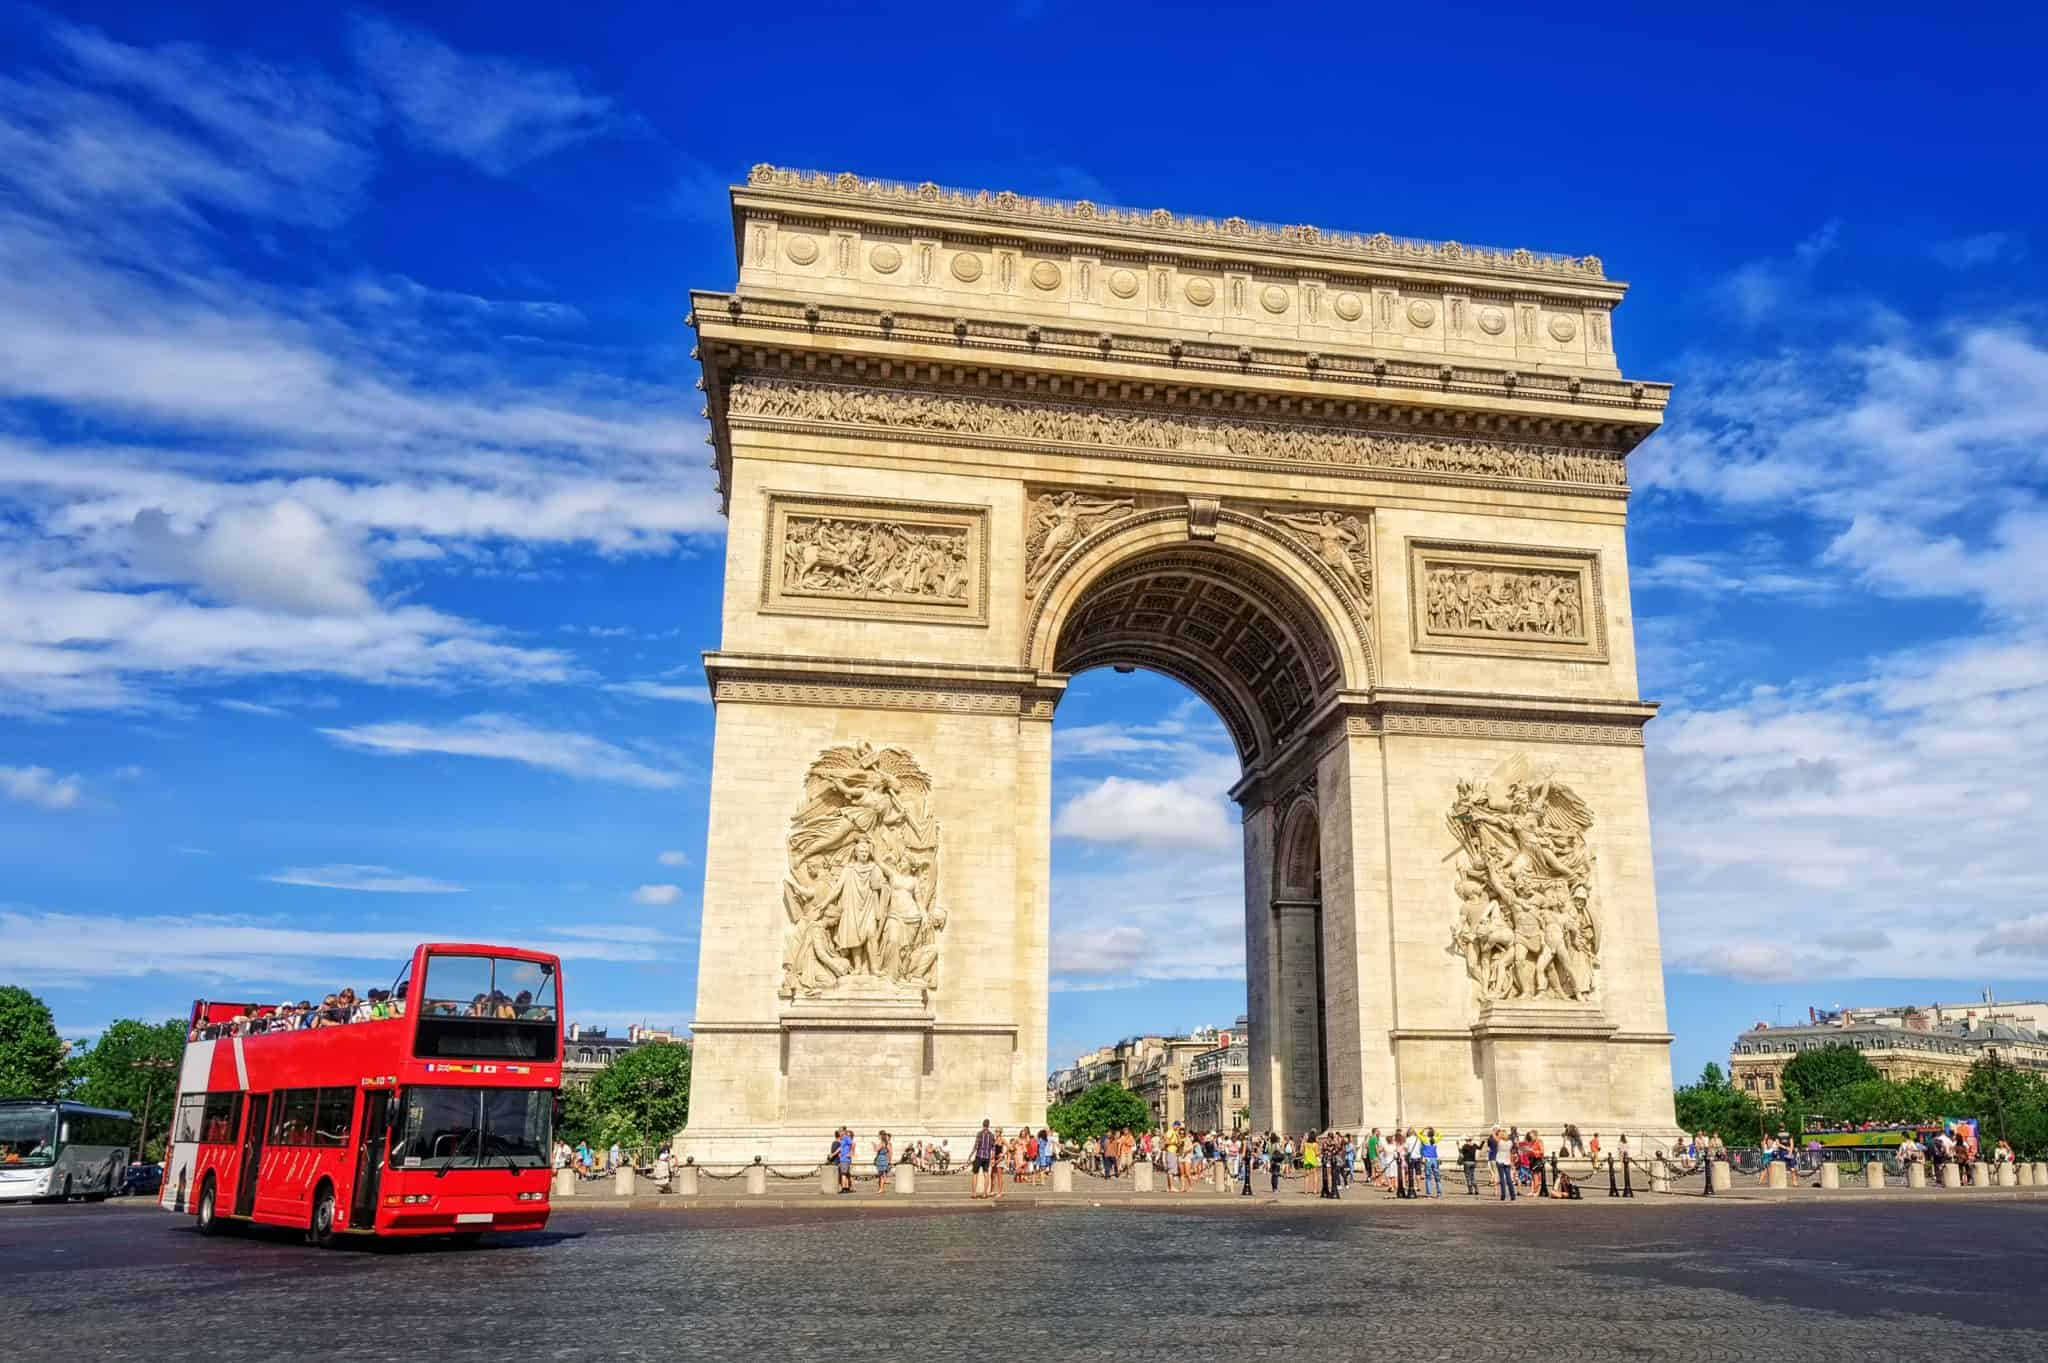 The Arc de Triomphe in Paris, part of 4 days 3 nights Paris